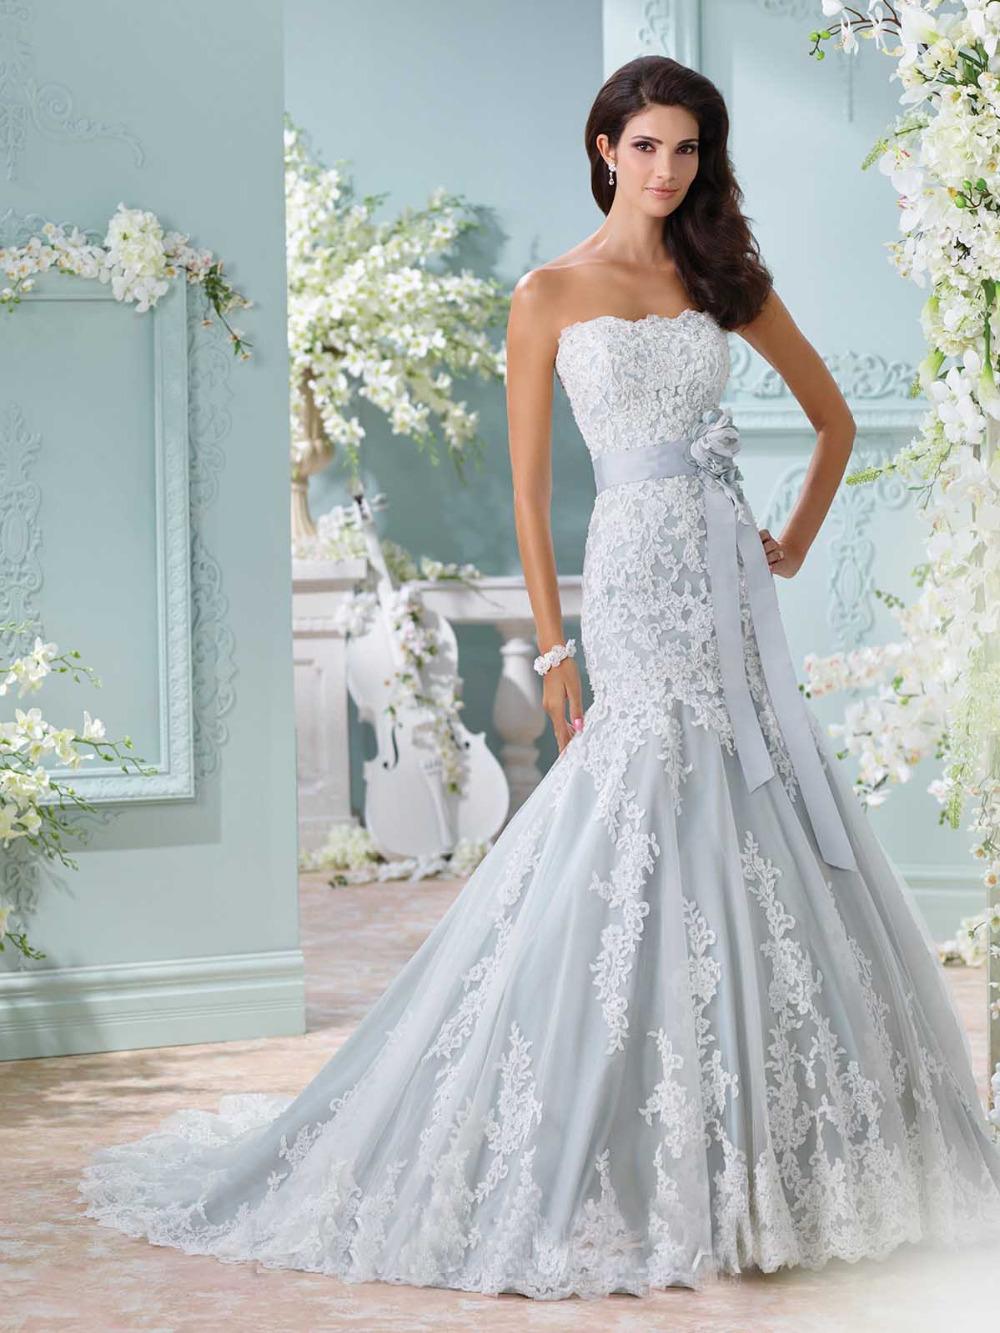 Blue Wedding Gown: Popular Ice Blue Wedding Dresses-Buy Cheap Ice Blue